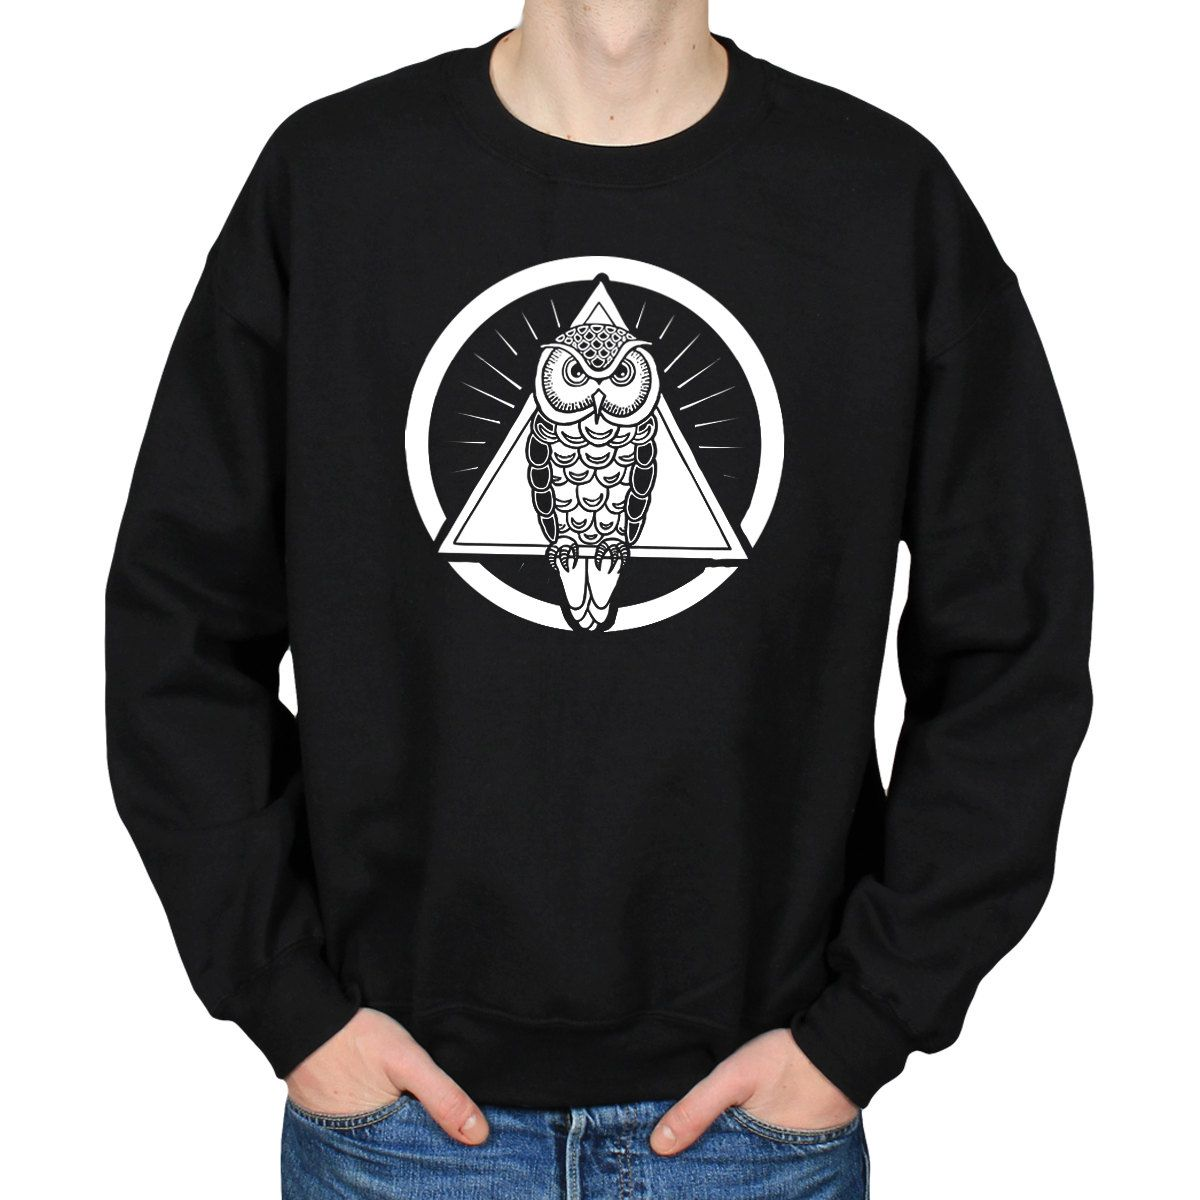 Owl print sweatshirt owl of minerva goddess of wisdom sweater owl print sweatshirt owl of minerva goddess of wisdom sweater illuminati nwo occult clothing cosy fleece lined crewneck slouchy jumper biocorpaavc